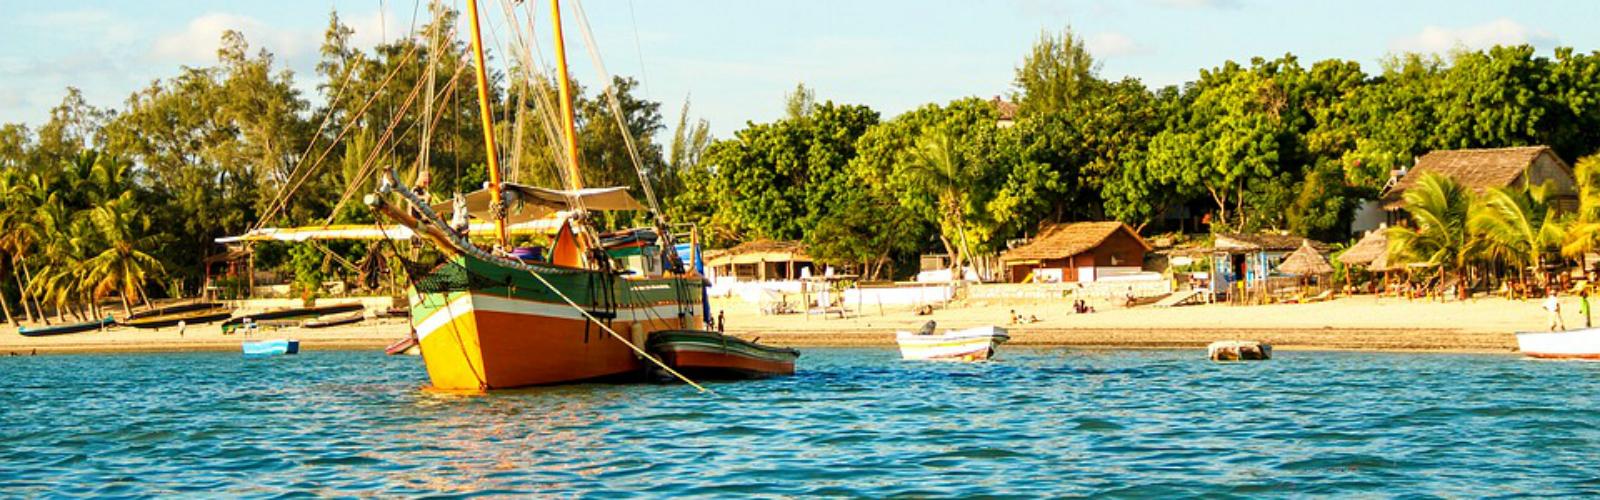 Vliegtickets naar Madagaskar boeken?